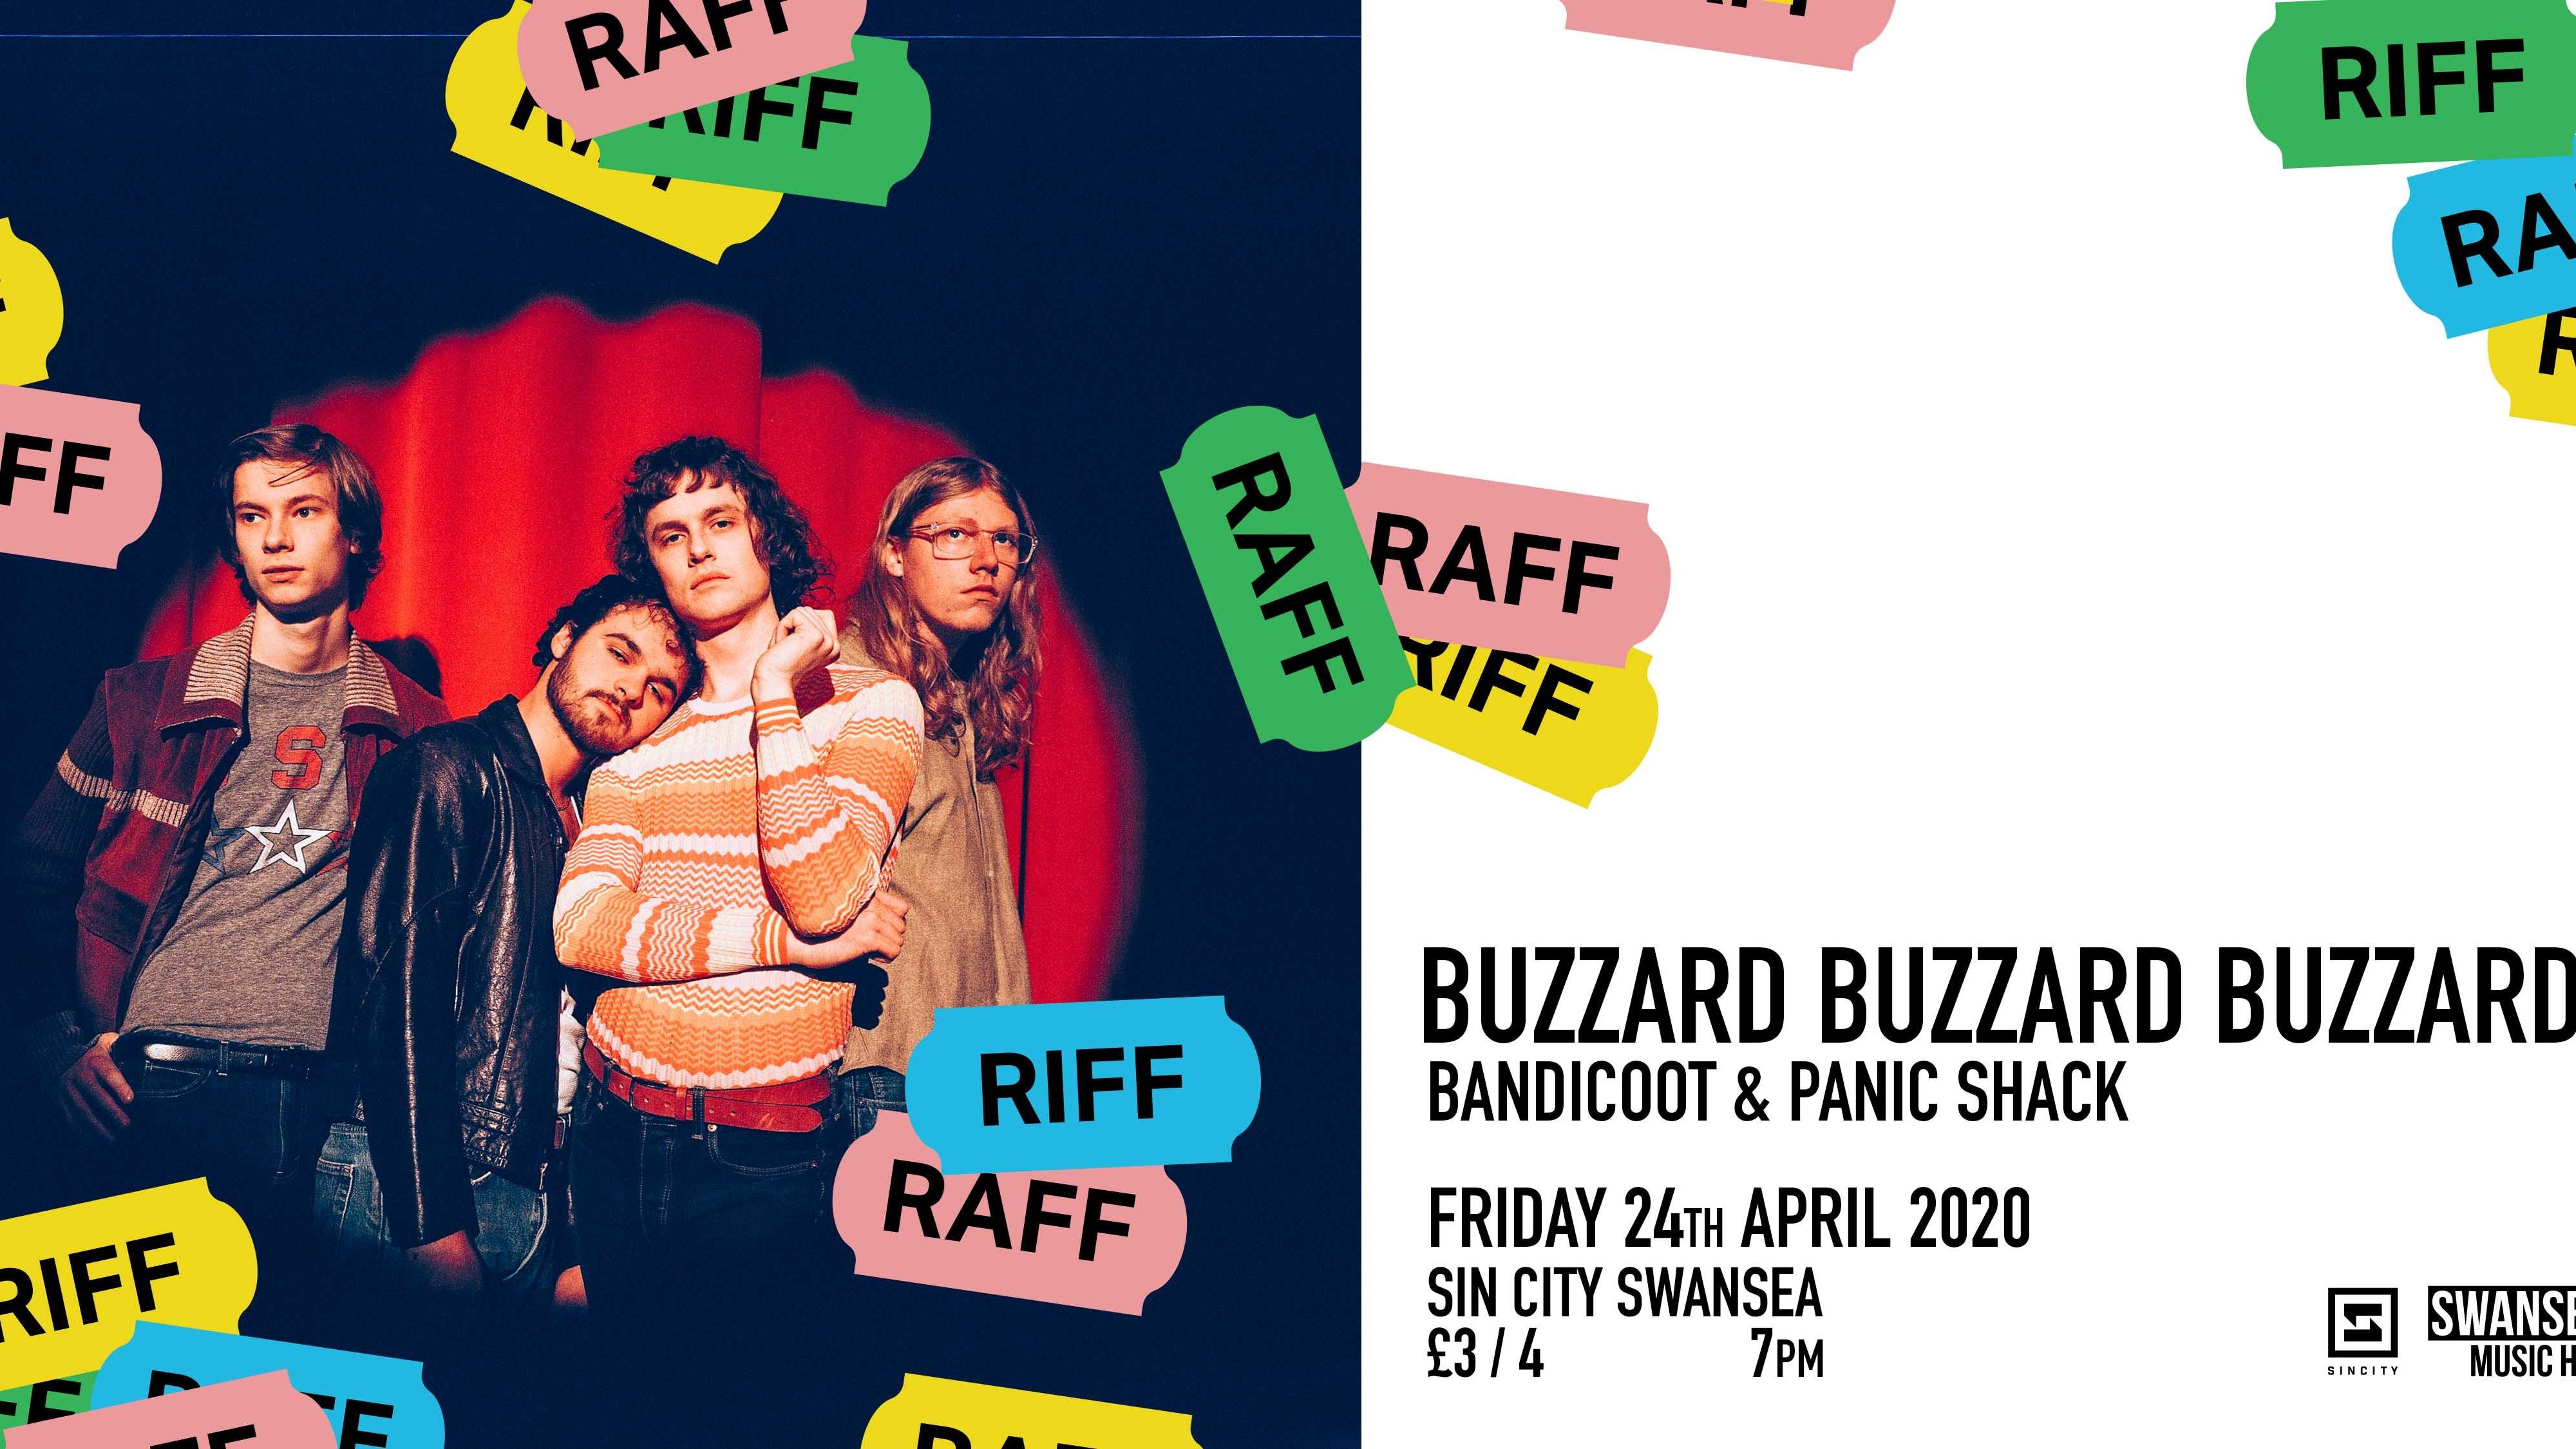 RIFF RAFF Introduces BUZZARD BUZZARD BUZZARD